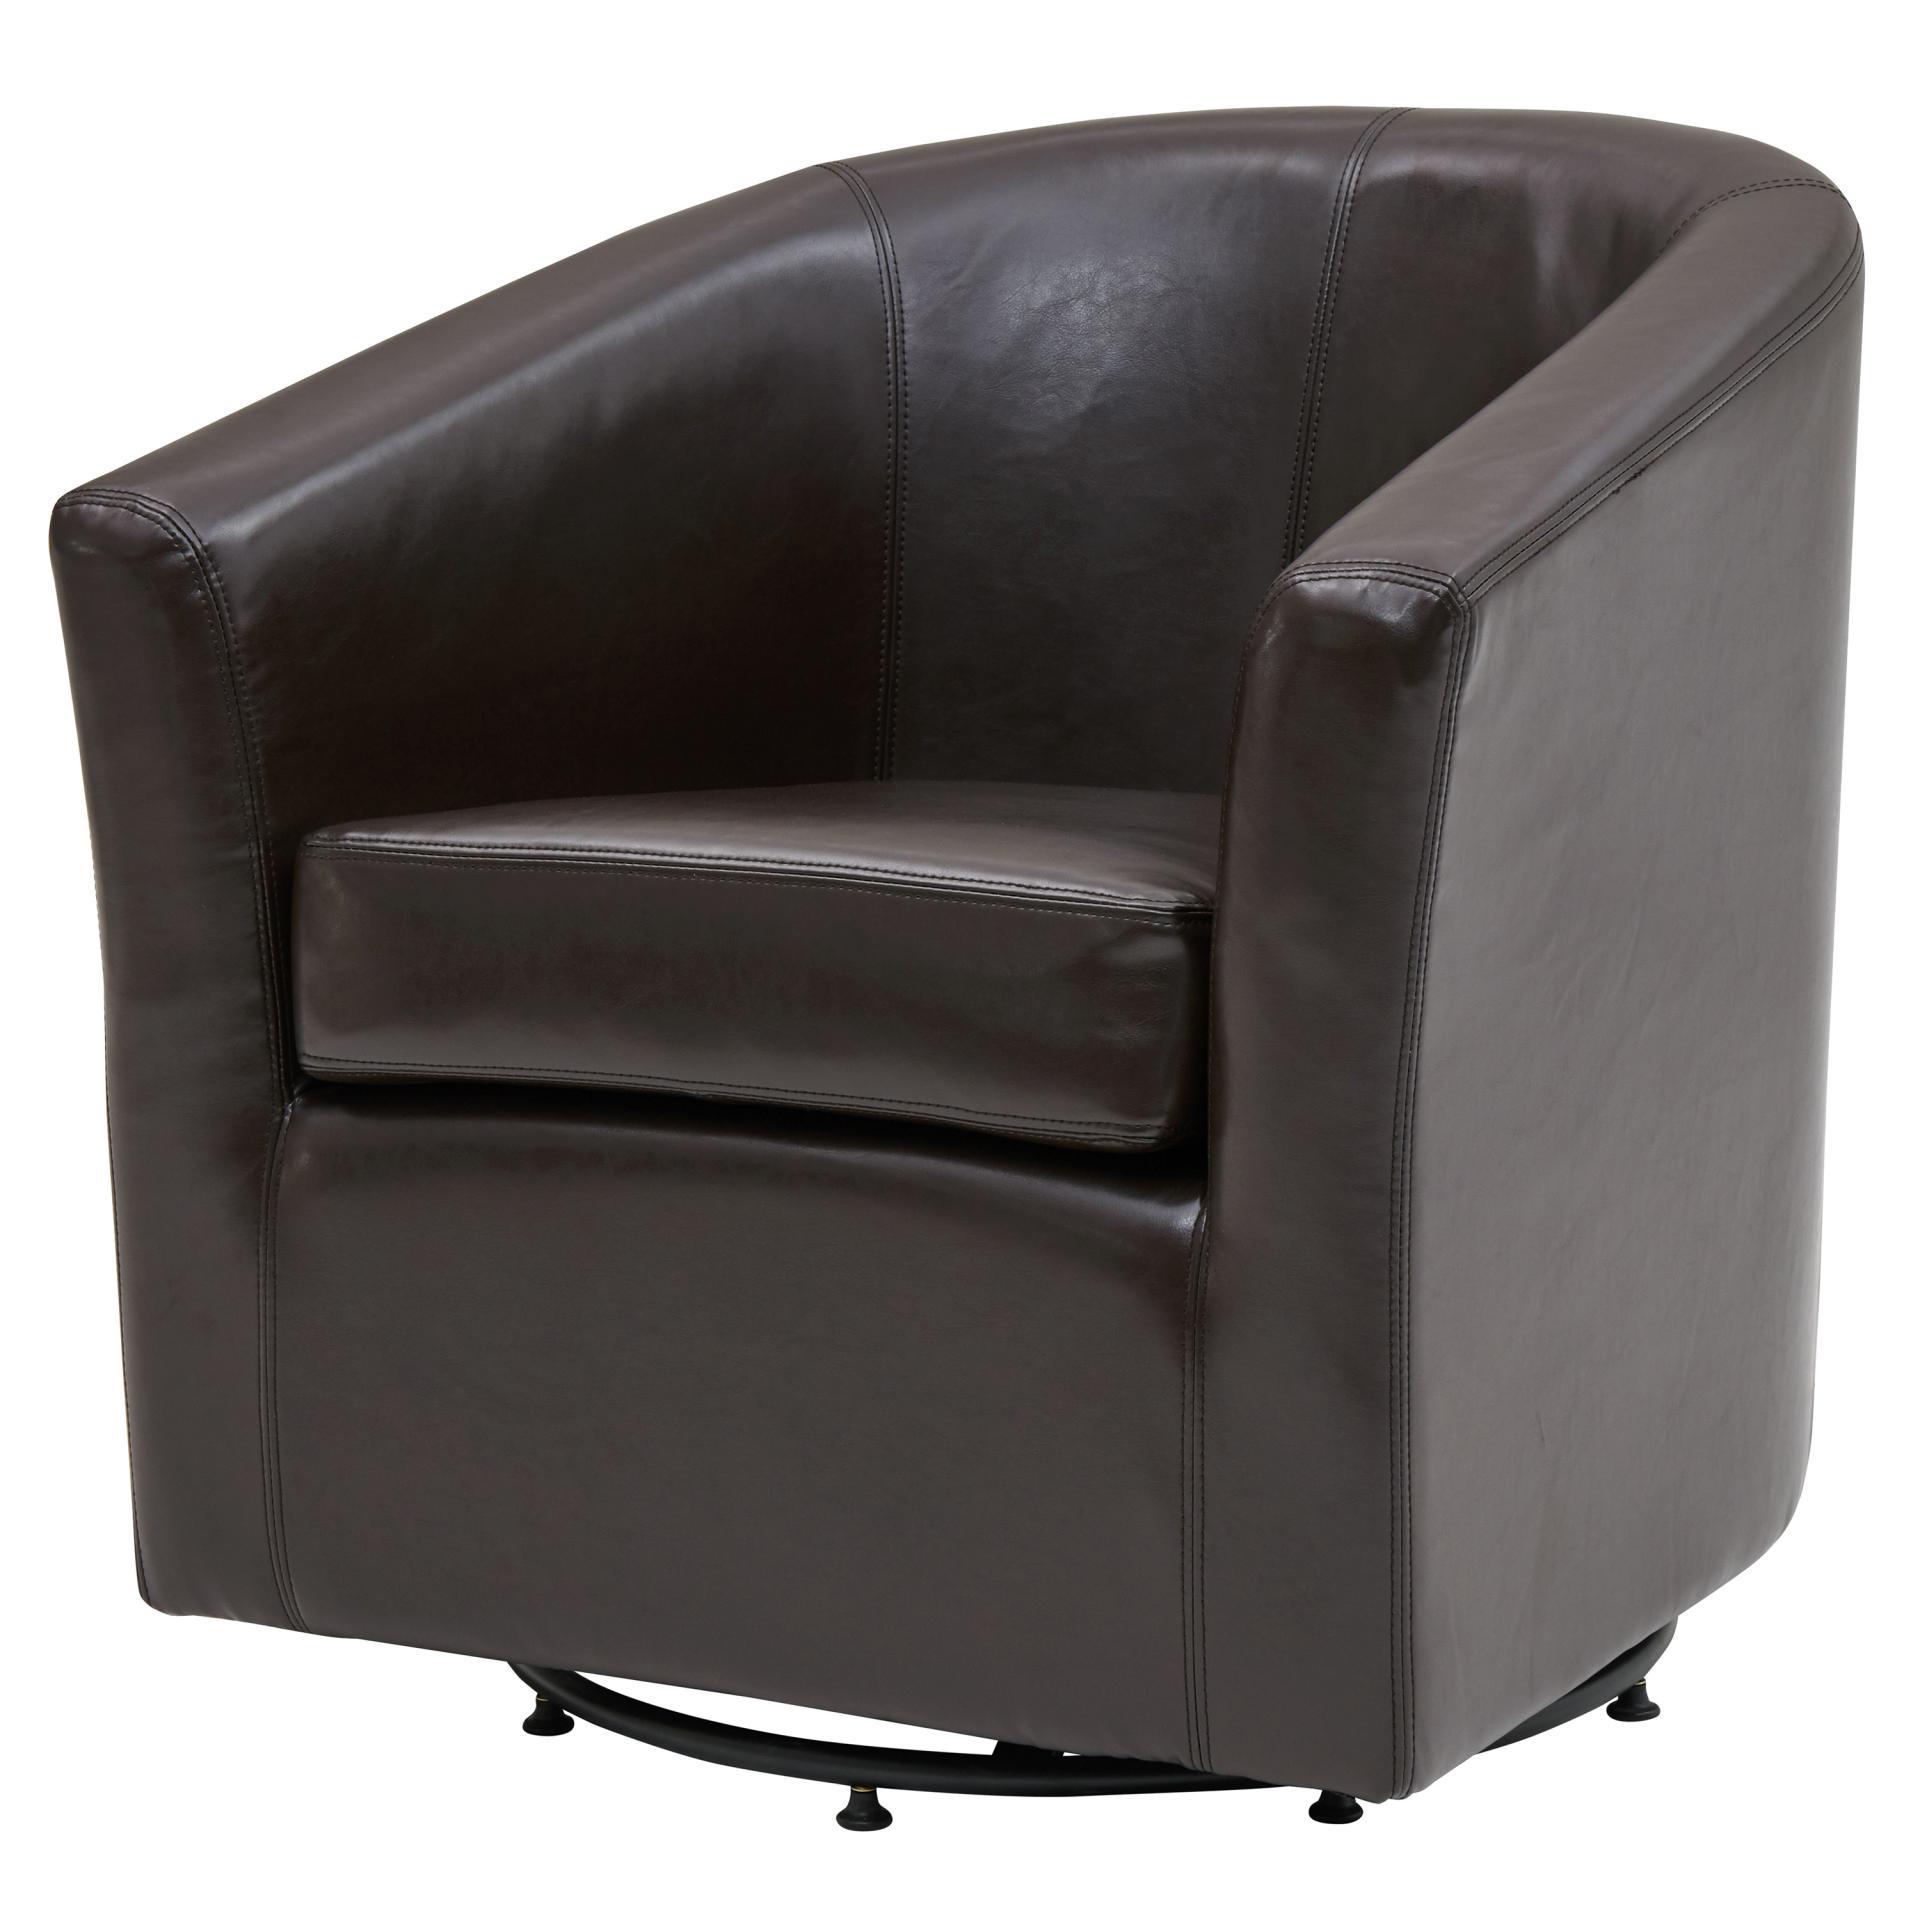 193012b 01 Npd Home Furniture Wholesale Lifestyle